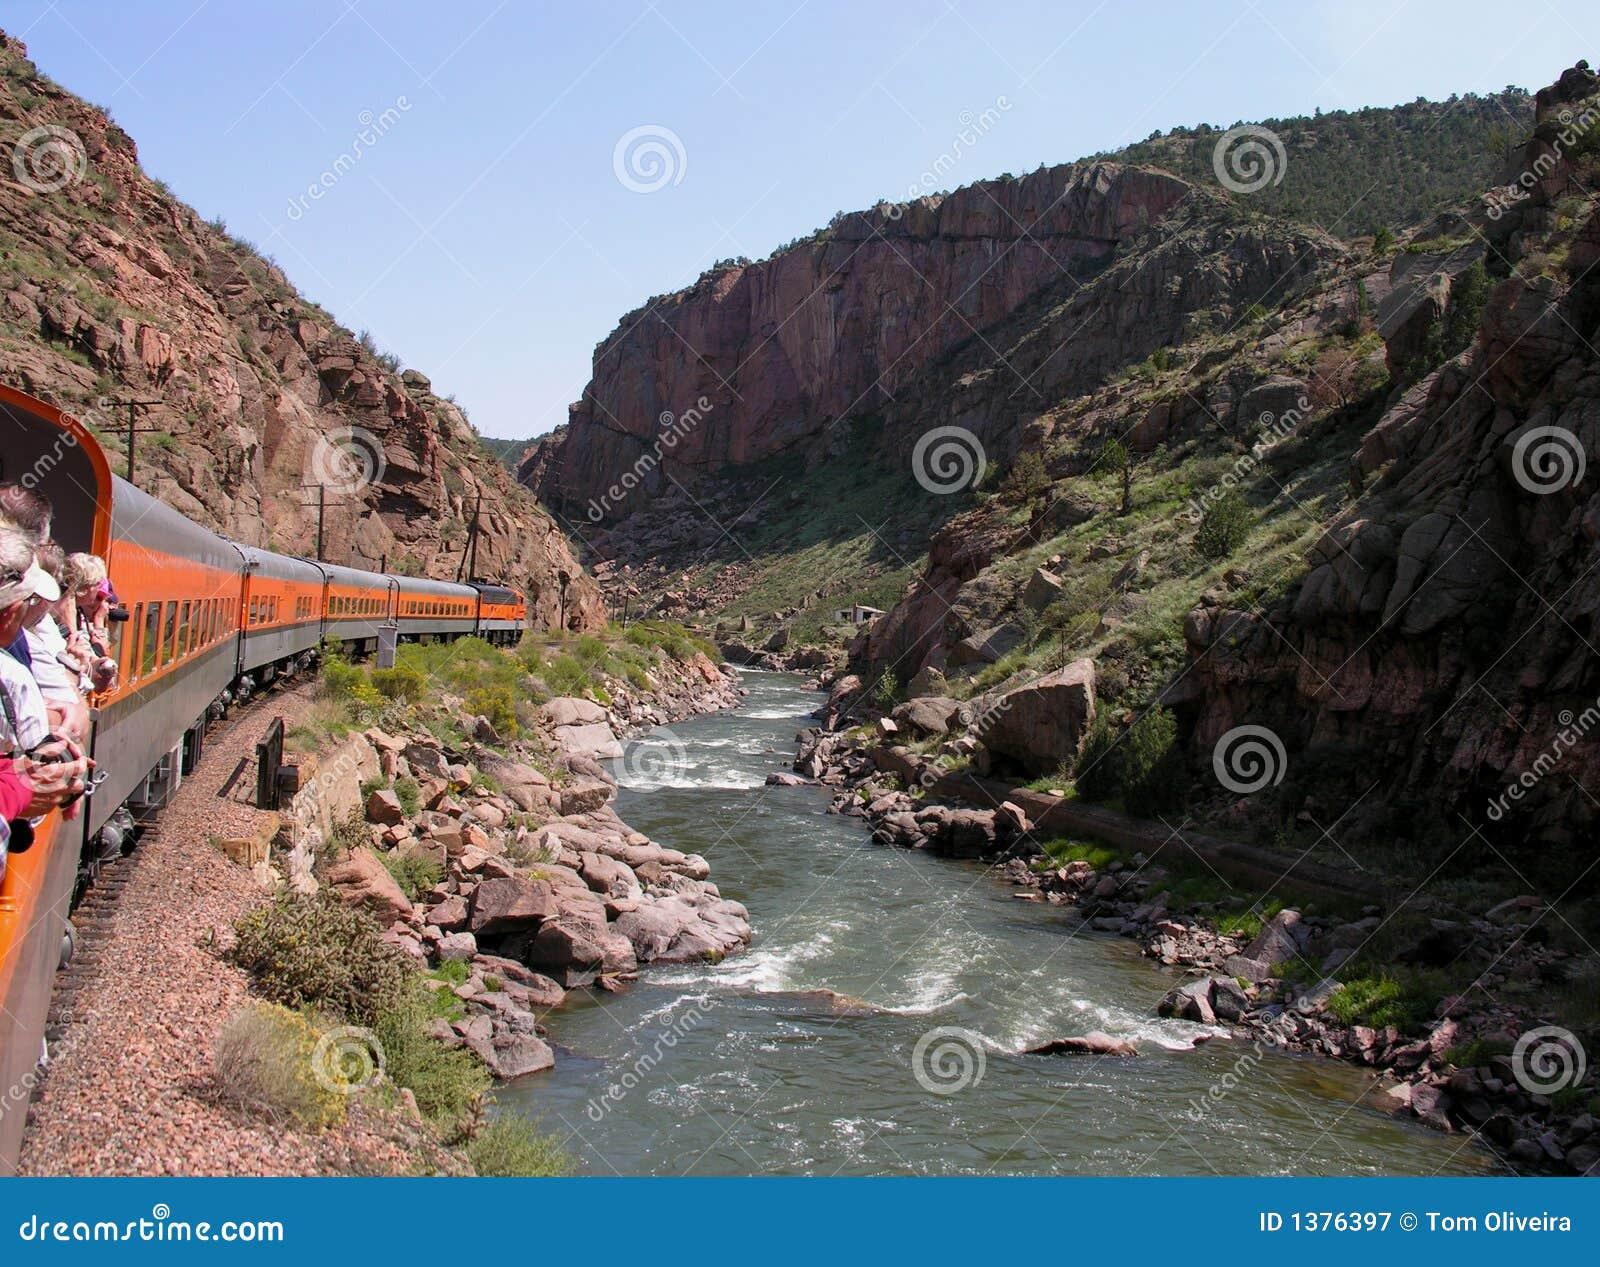 Turista no trem